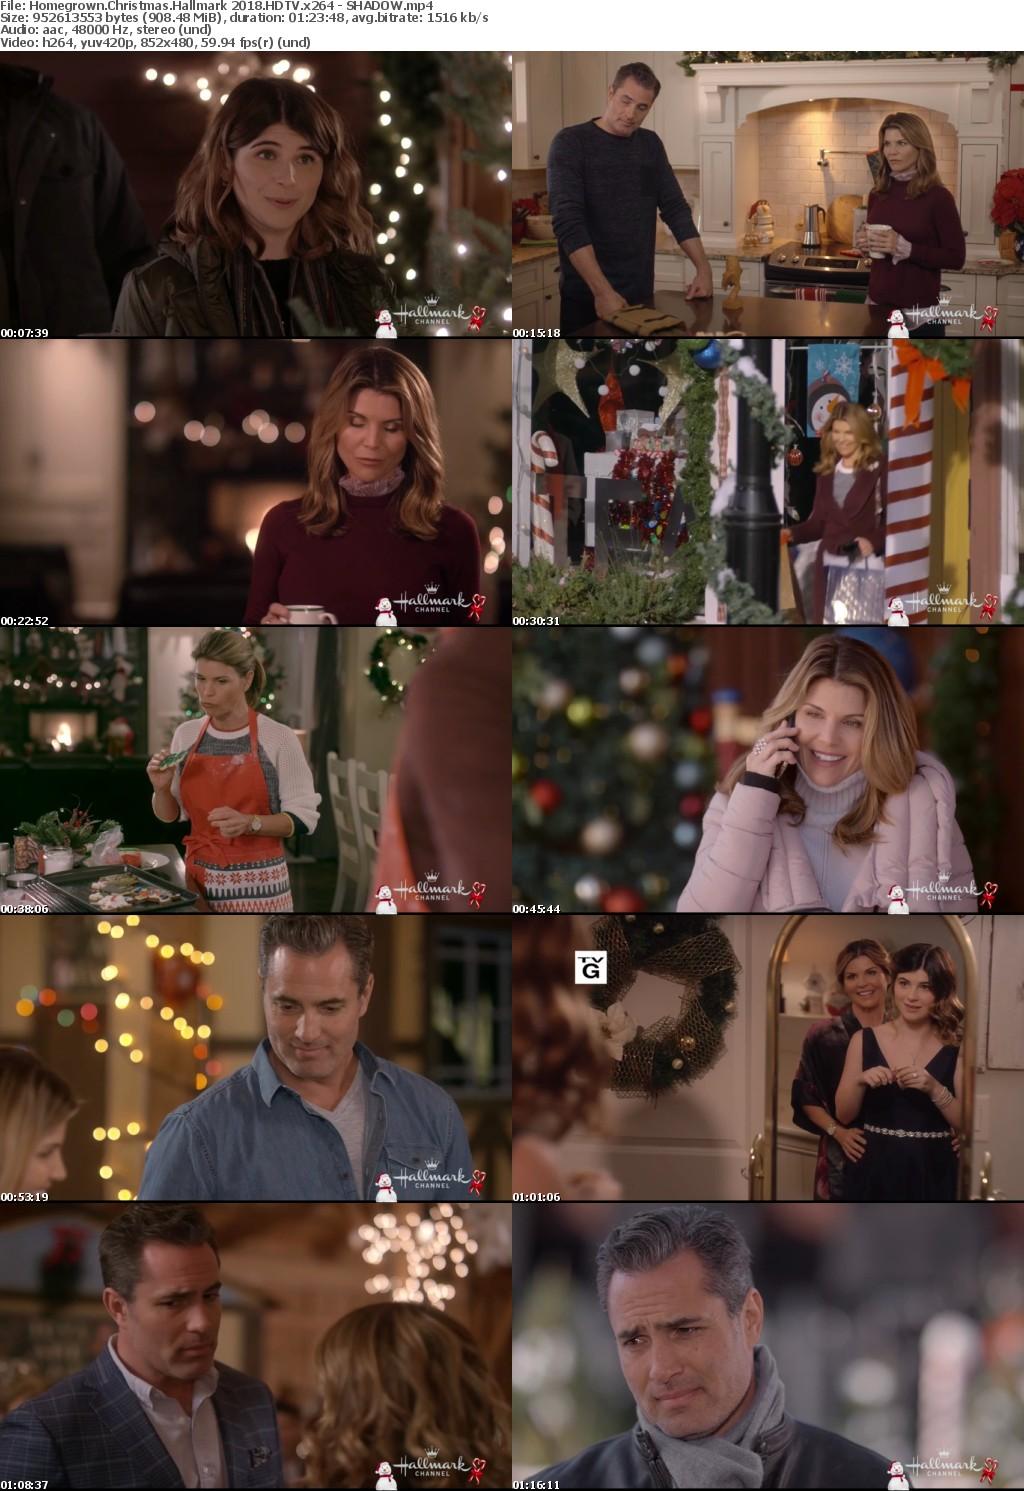 Homegrown Christmas Hallmark (2018) HDTV x264 - SHADOW